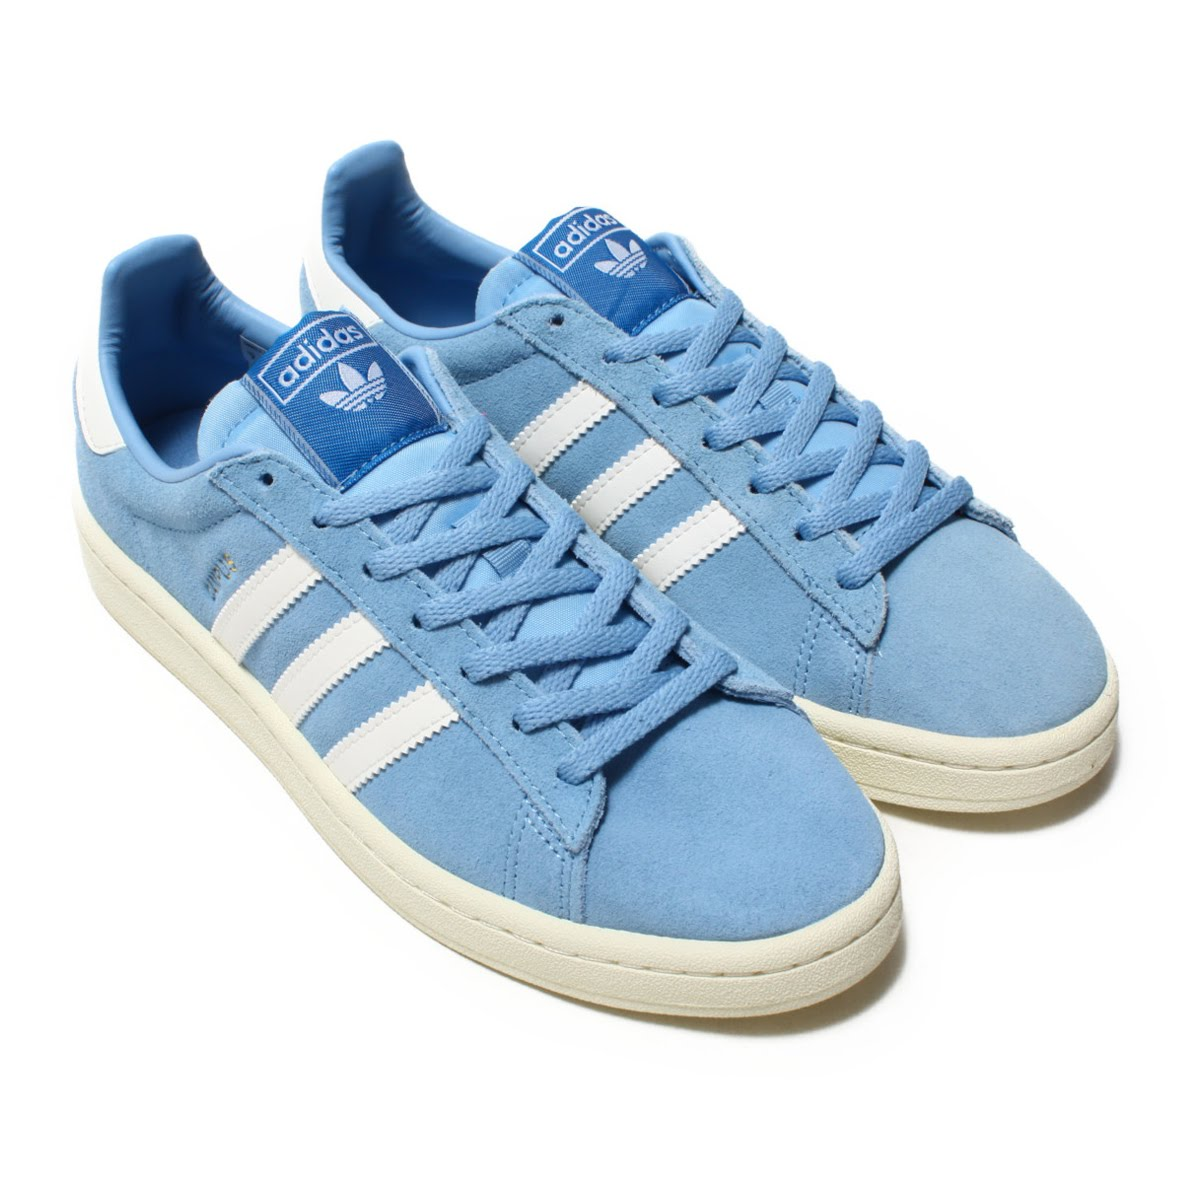 adidas campus ash blue OFF66% pect.se!